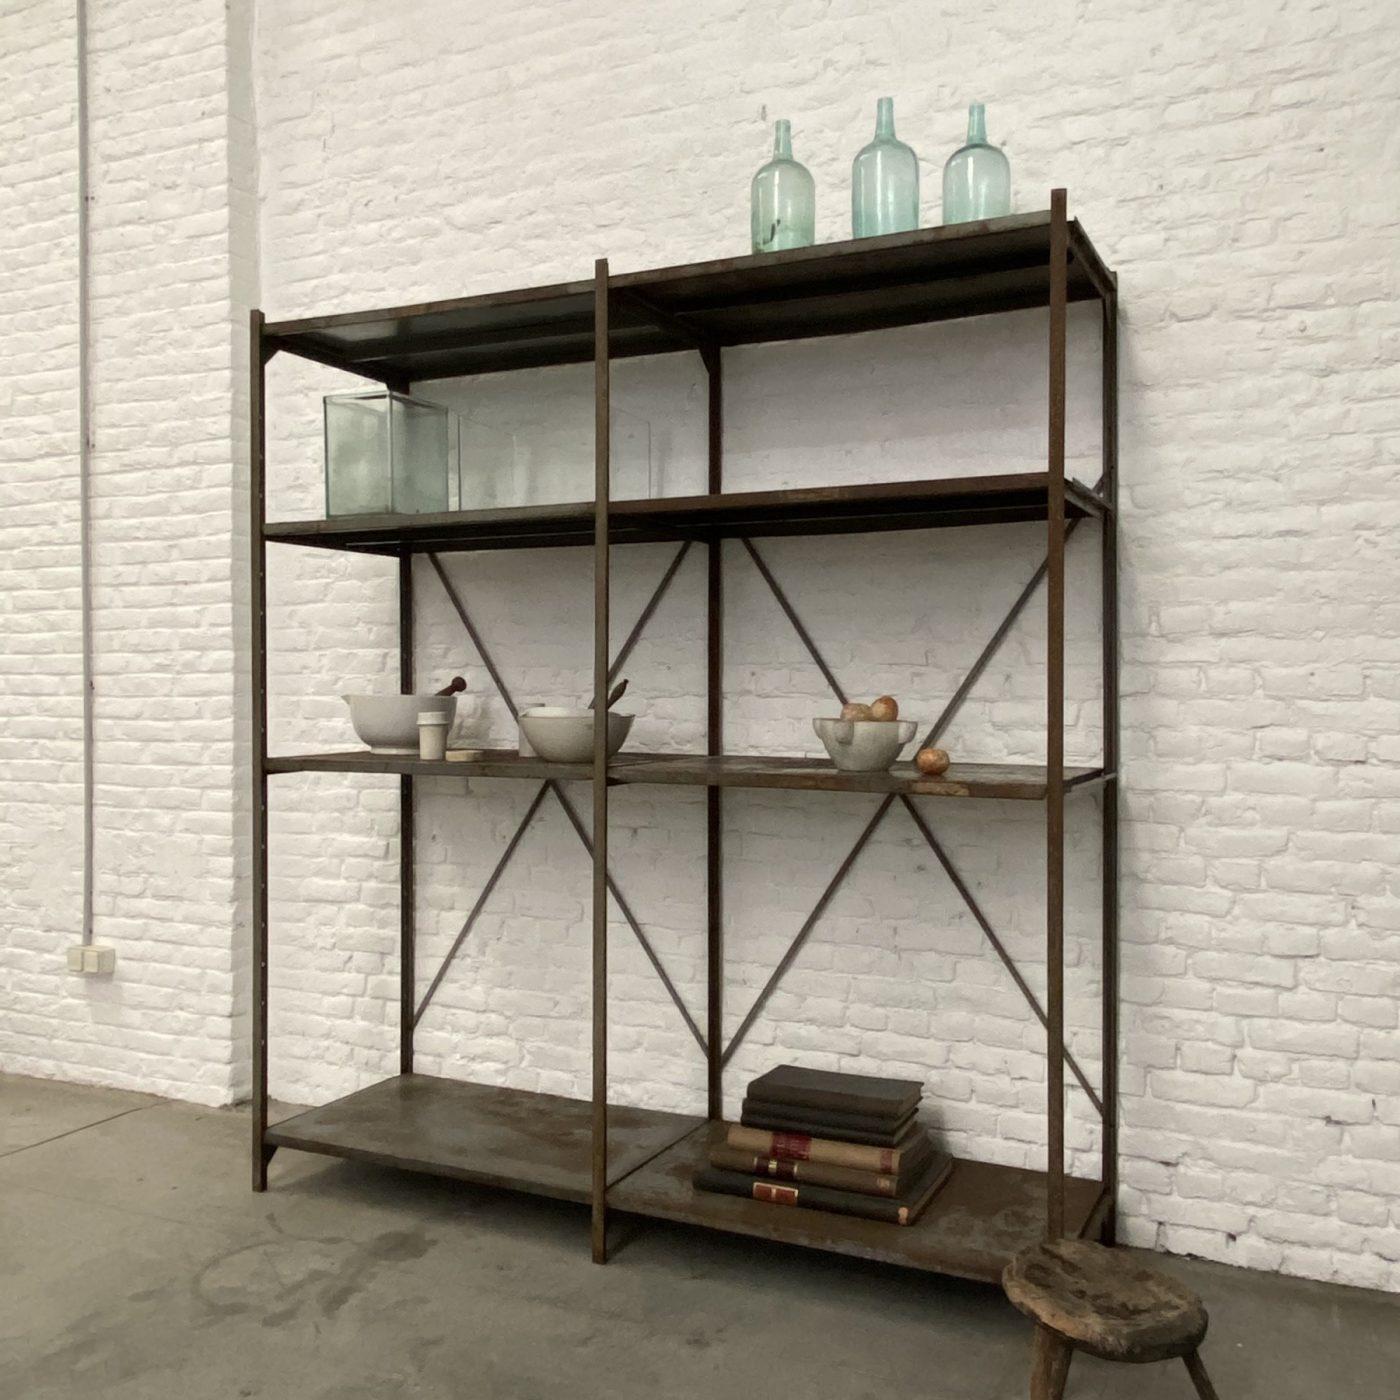 objet-vagabond-industrial-shelf0006